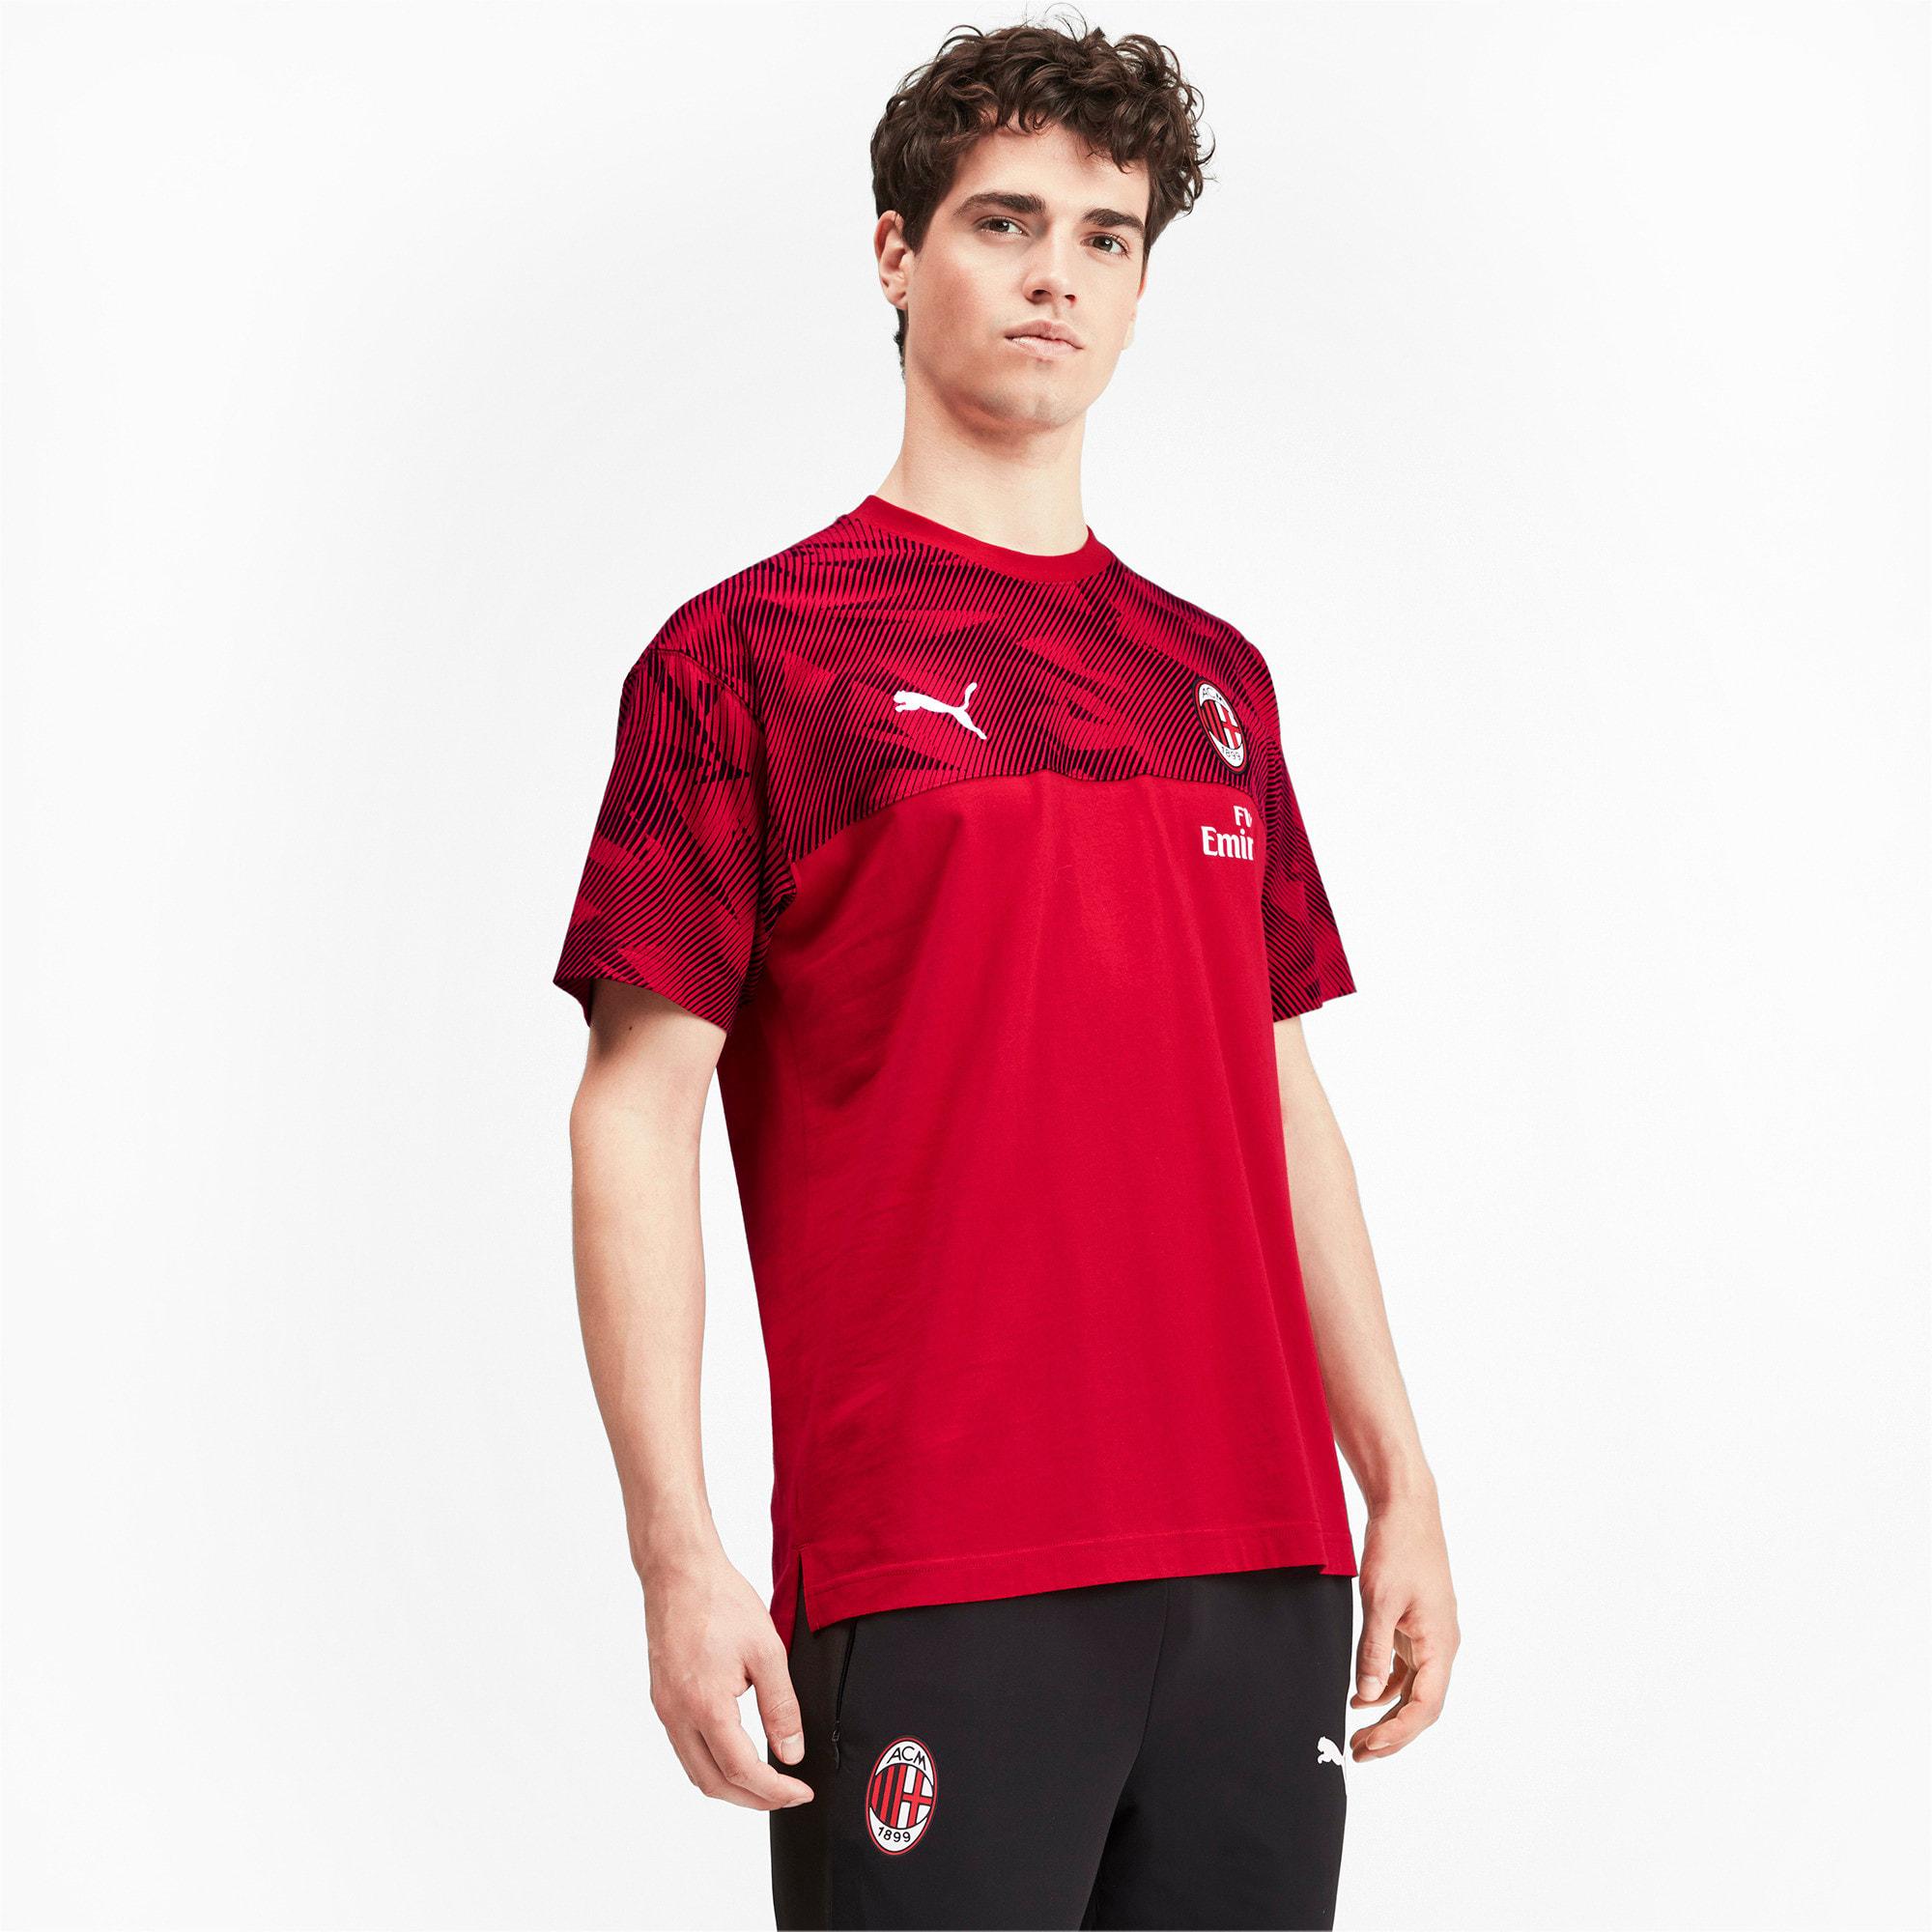 Thumbnail 1 of AC Milan Casuals Men's Tee, Tango Red -Puma Black, medium